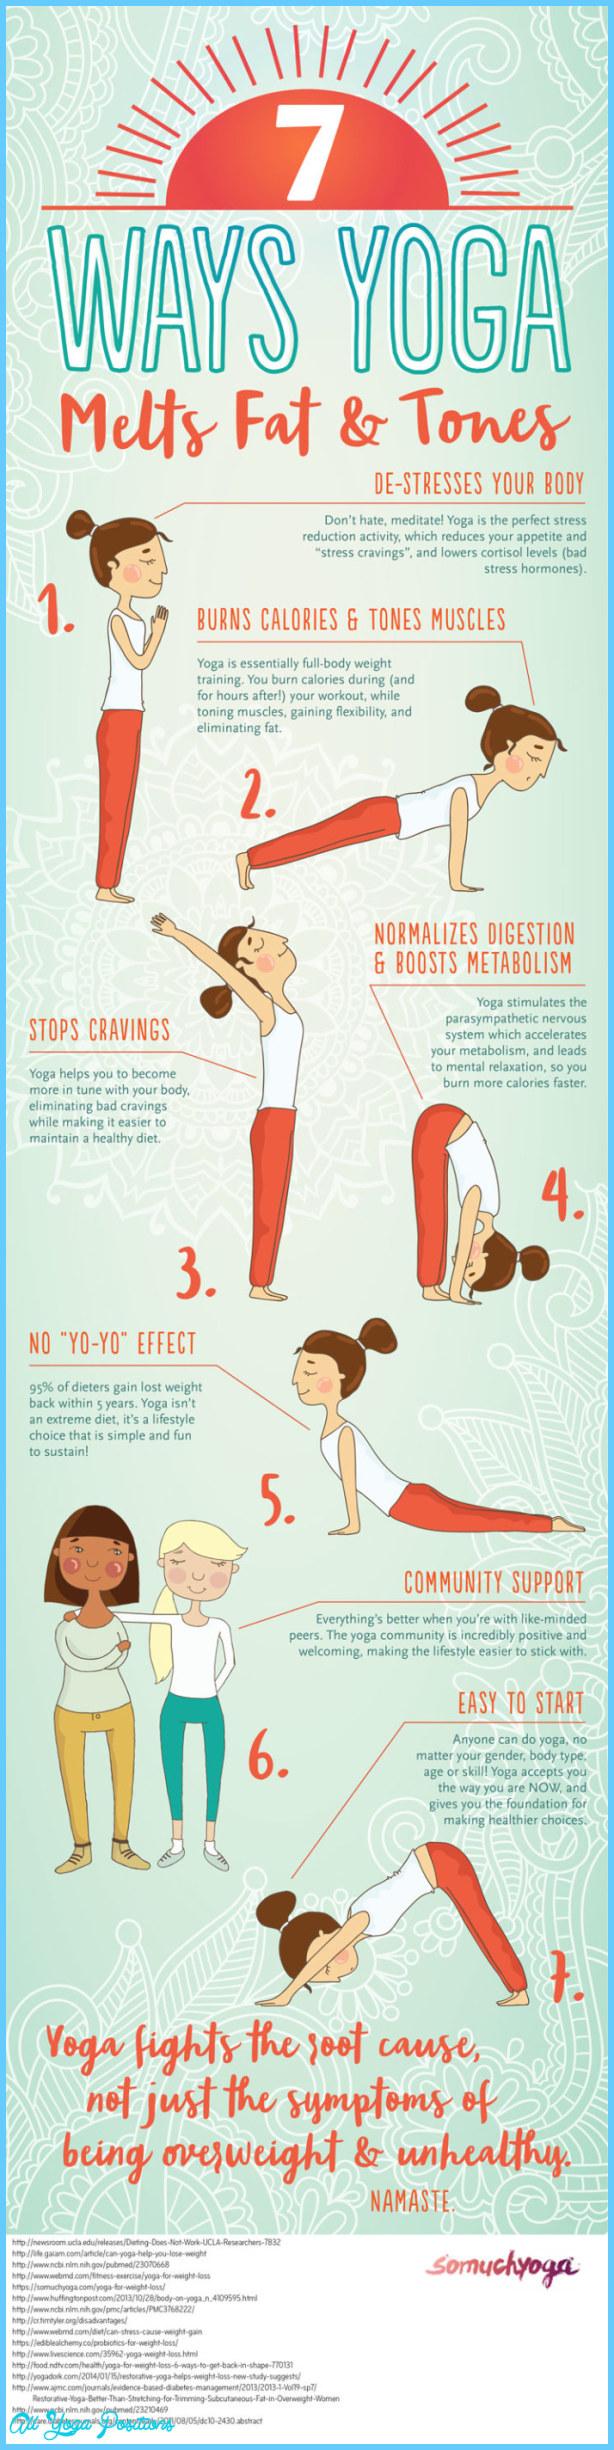 Yoga poses to increase weight loss  _9.jpg